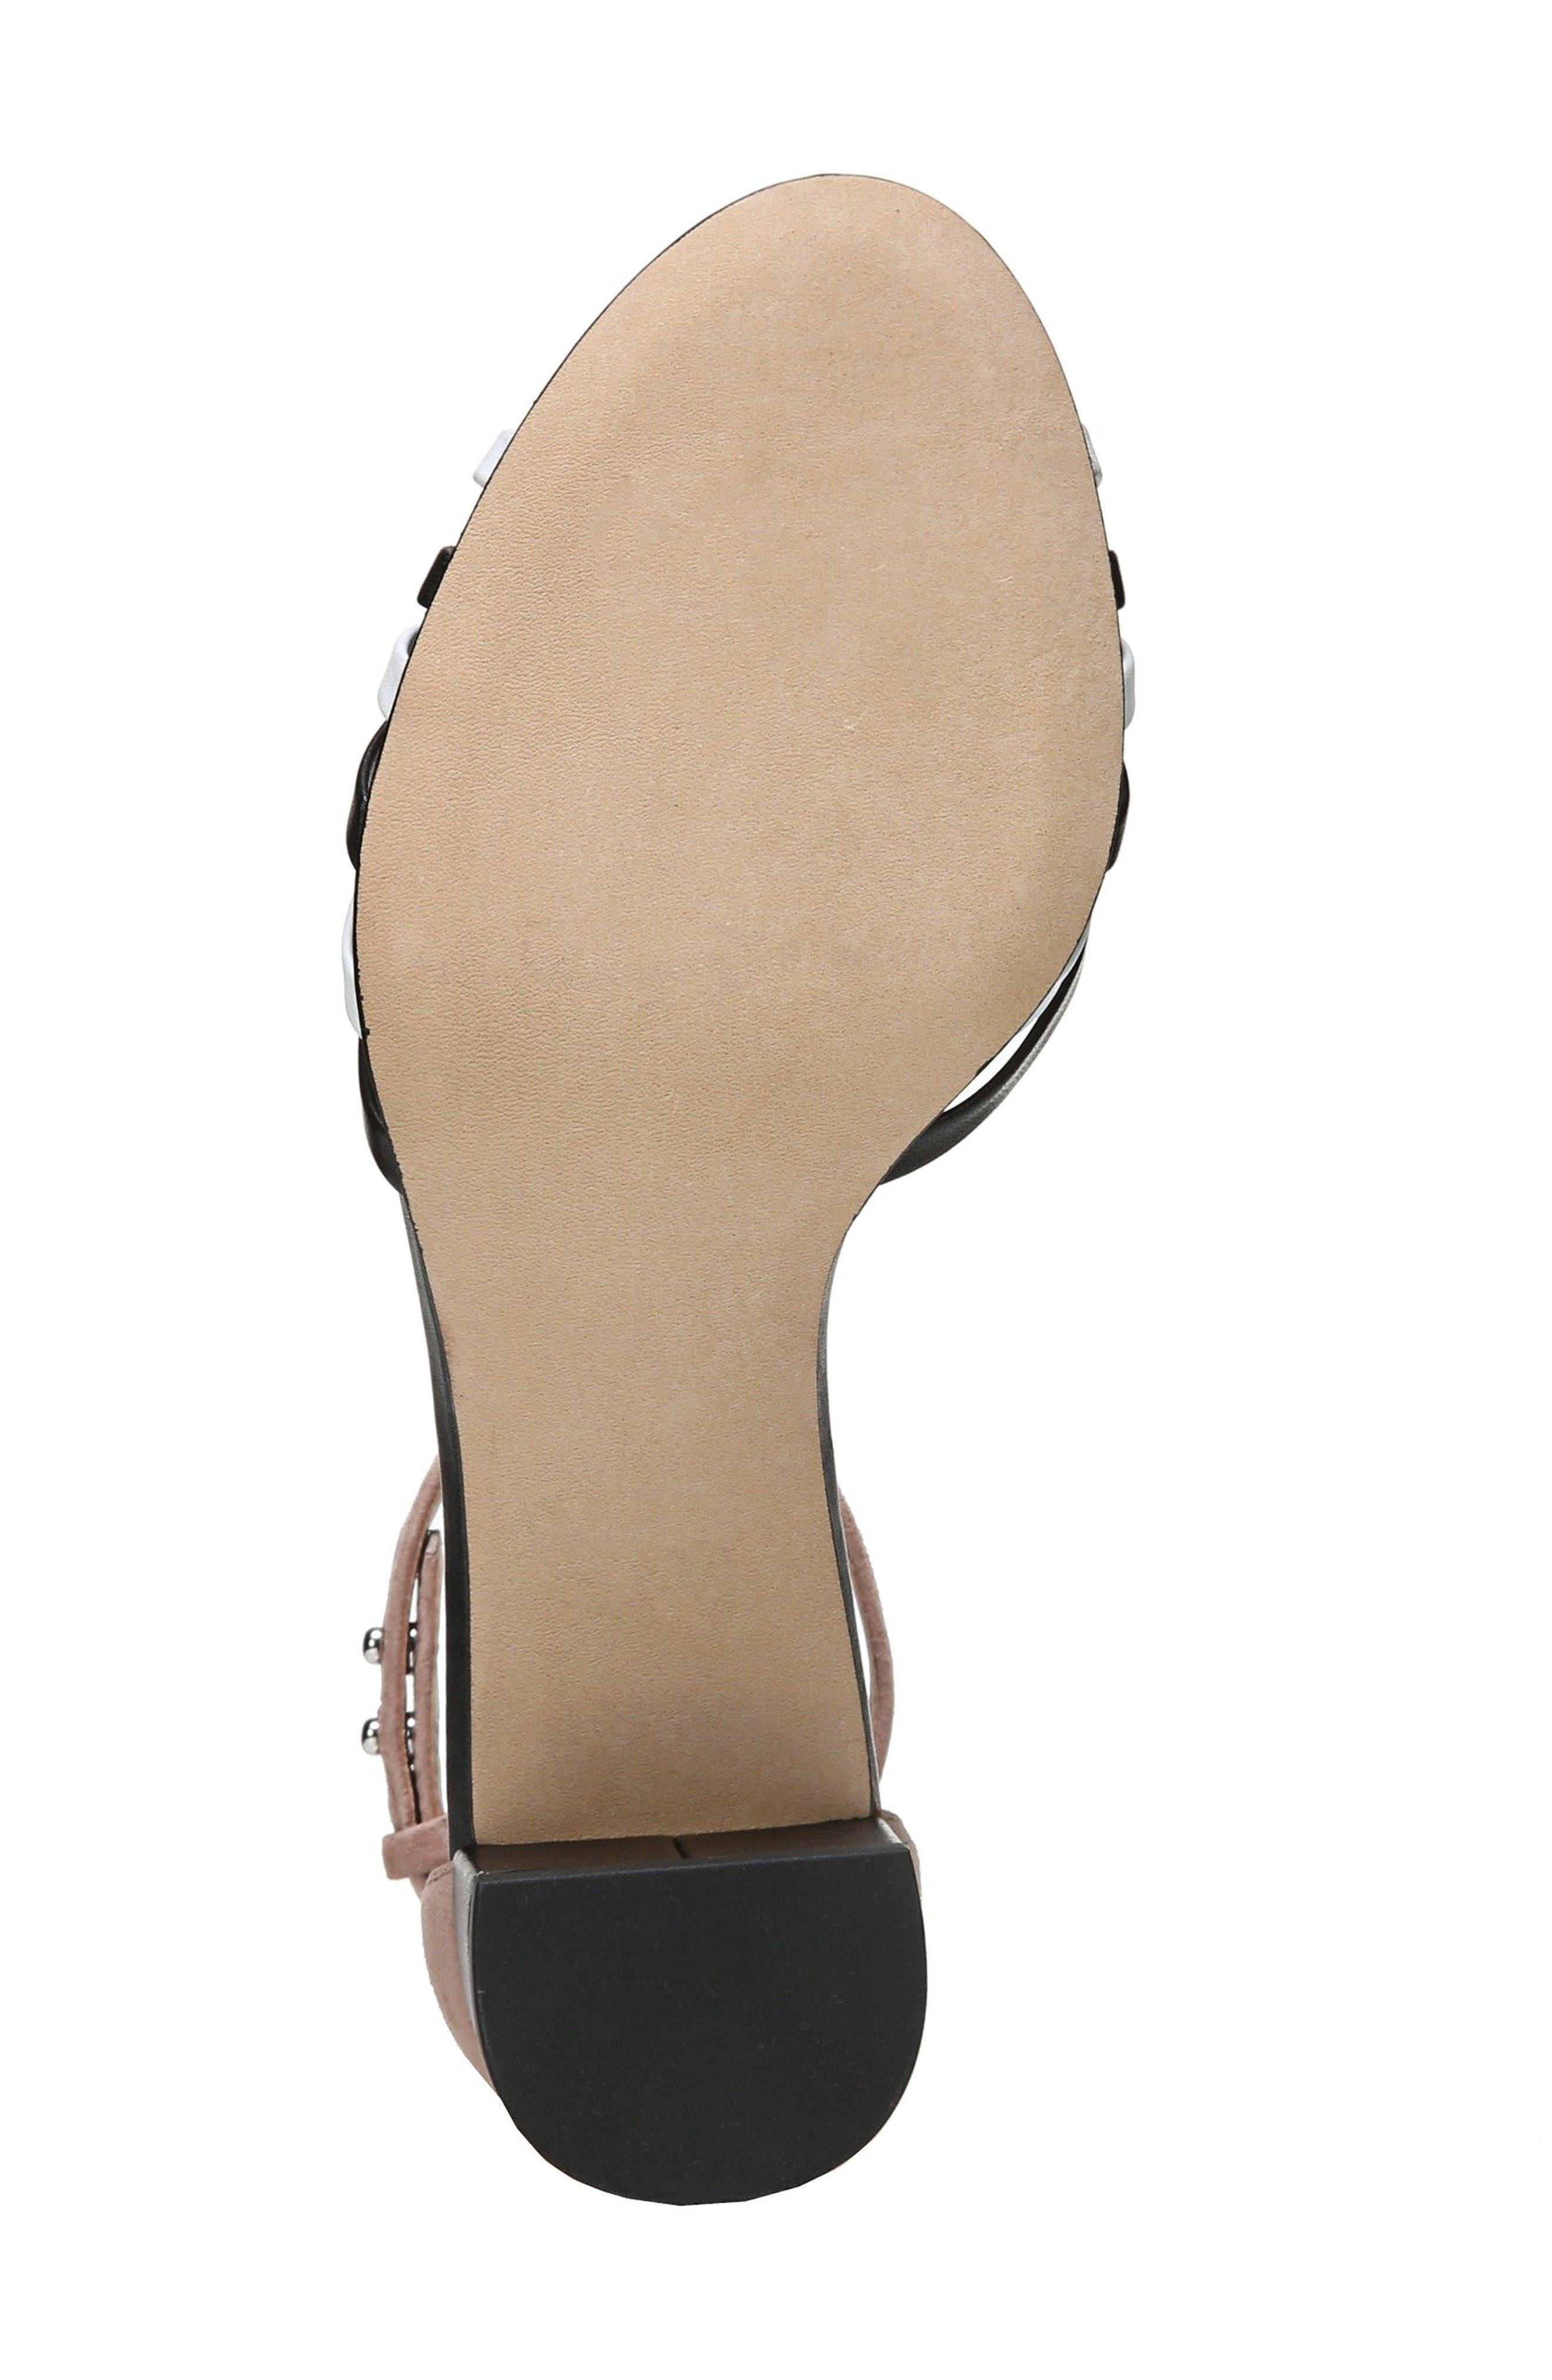 Fonseca Ankle Strap Sandal,                             Alternate thumbnail 6, color,                             001